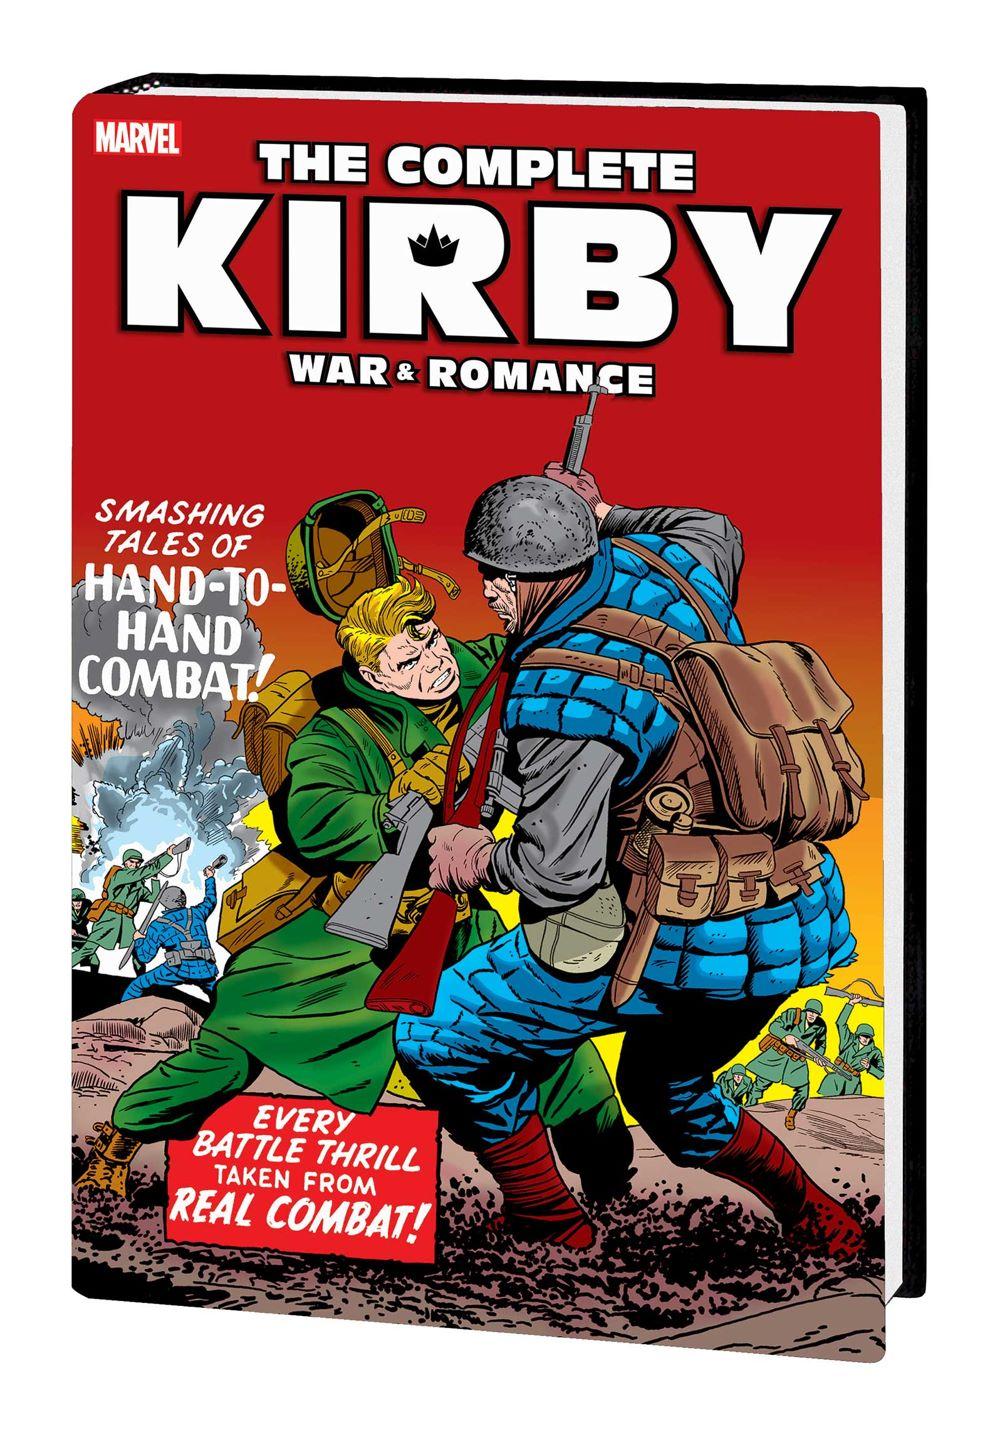 KIRBYLOVEWAR_OMNIBUS_HC_A Marvel Comics January 2021 Solicitations